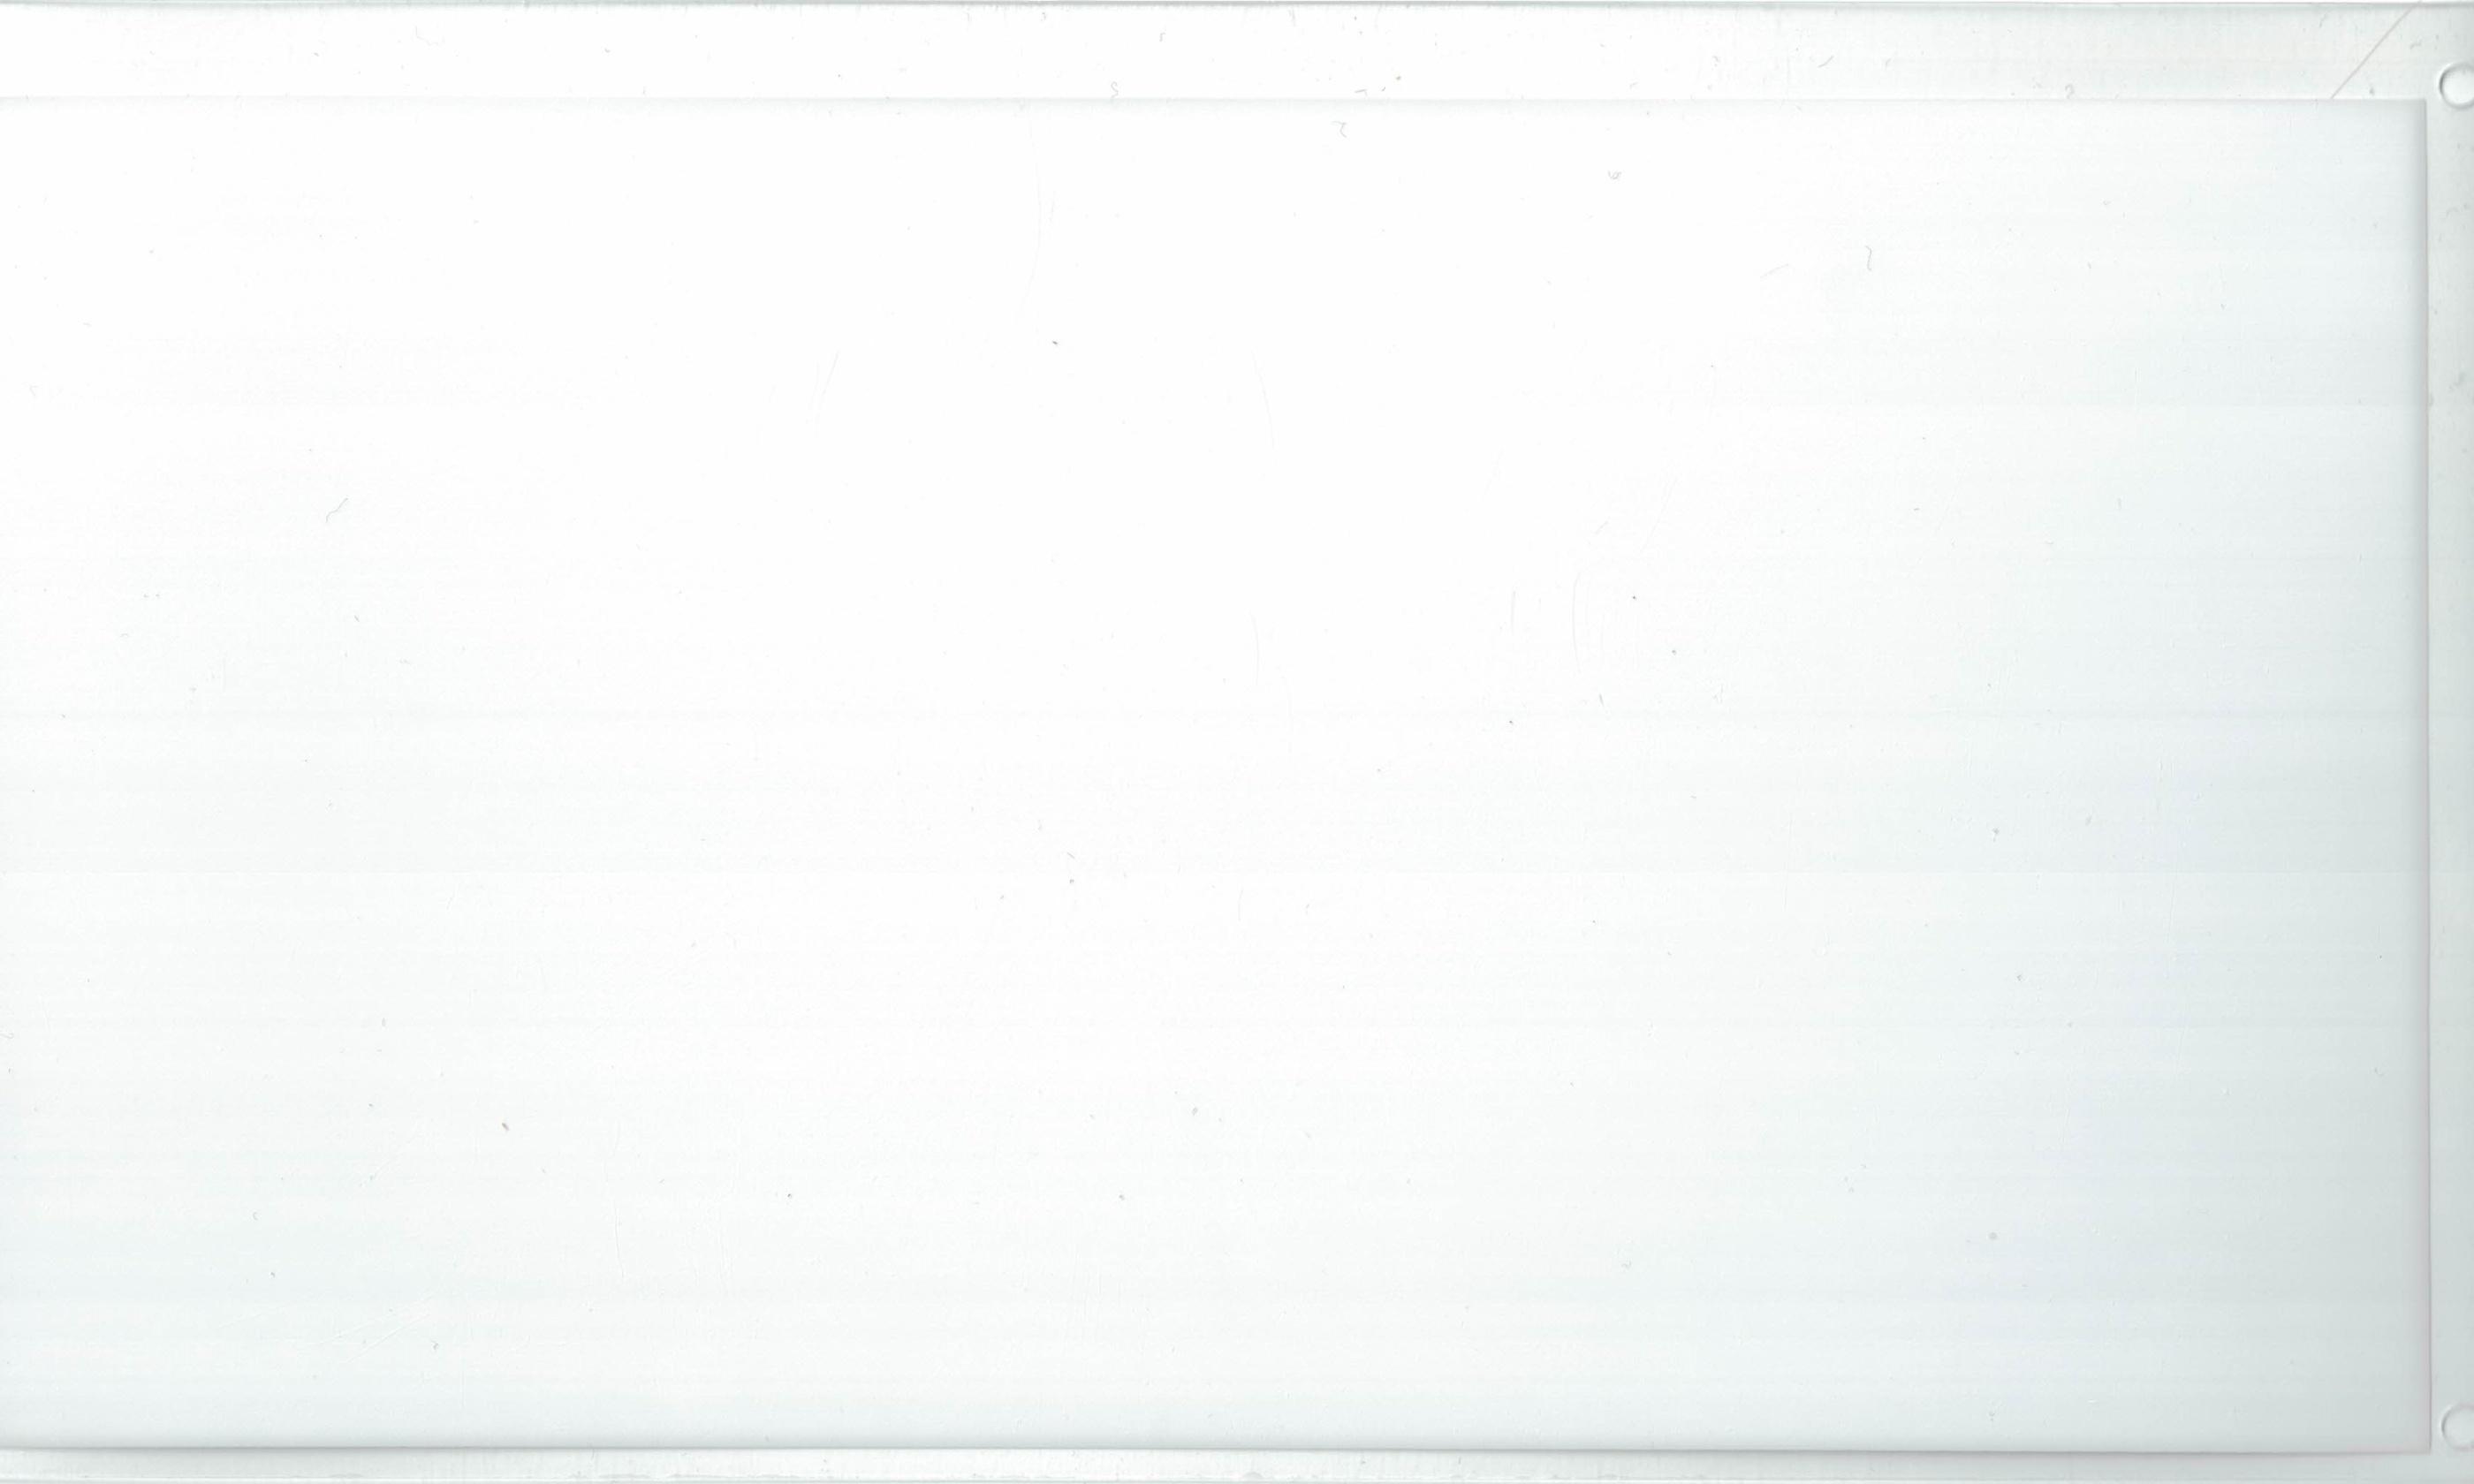 Frontskiva U 32  blank 346x174mm 16-7200-18           20180130